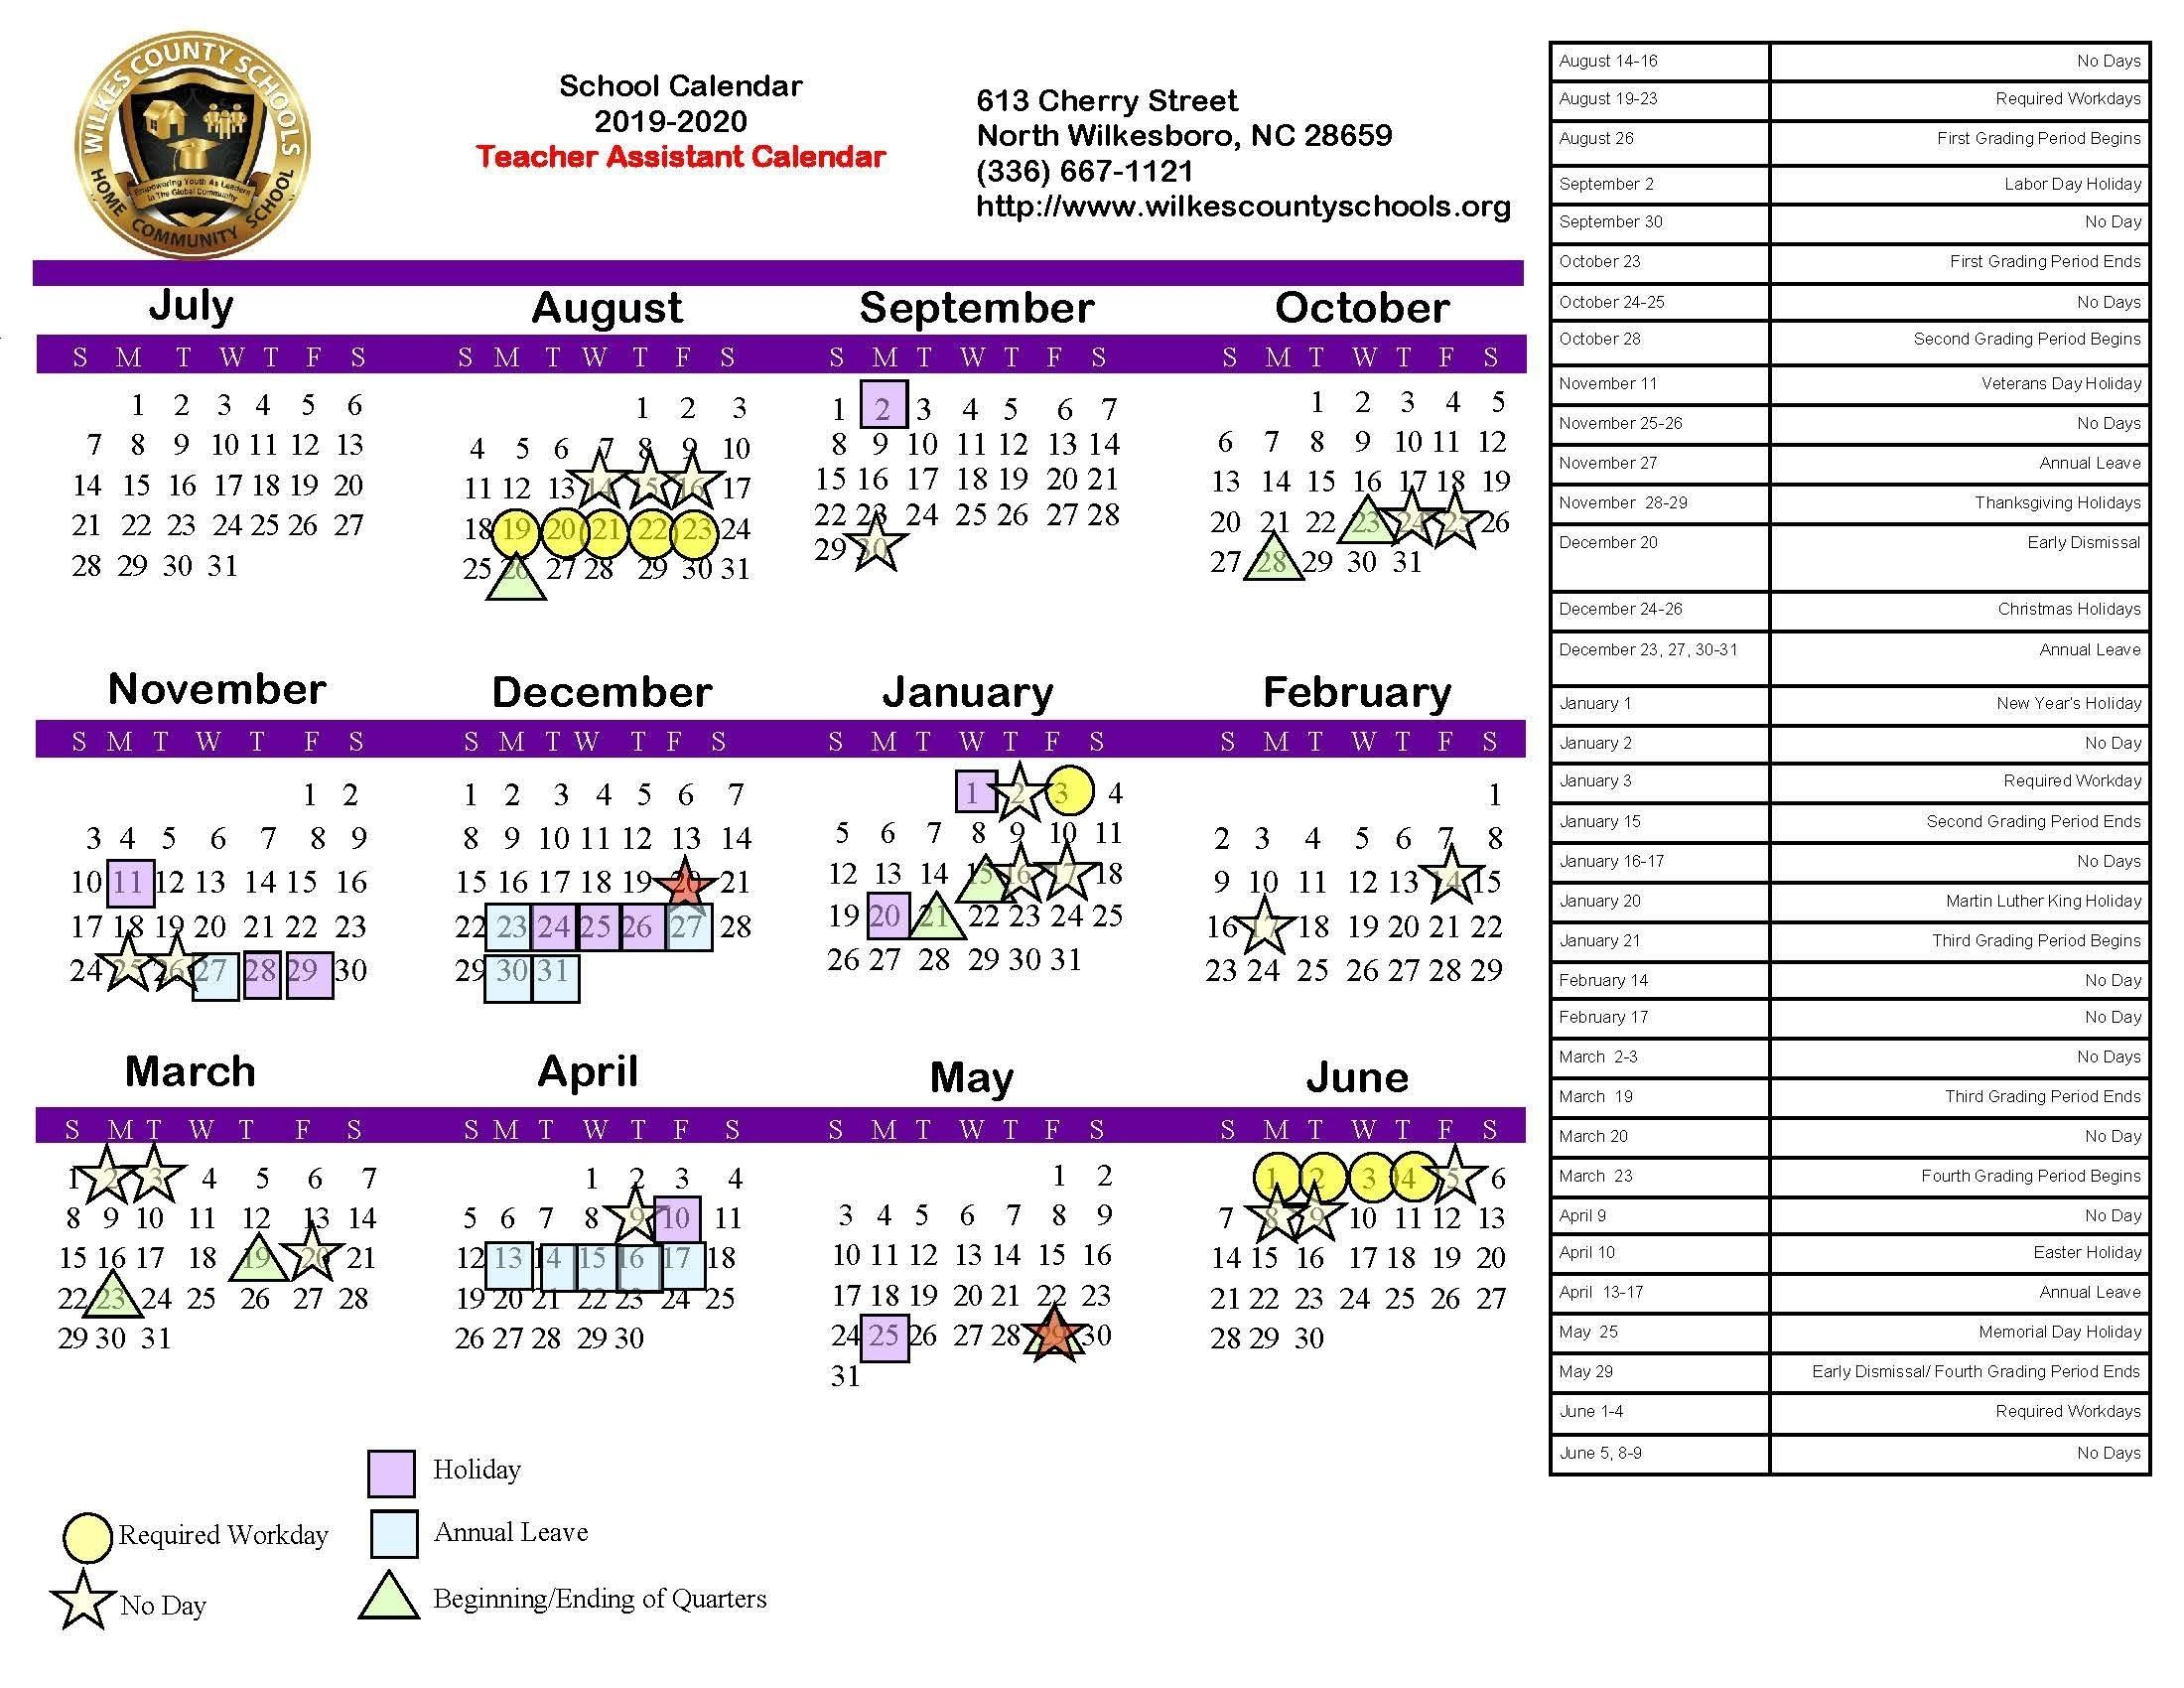 U Of M Calendar 2019-2020 School Year | Calendar Template